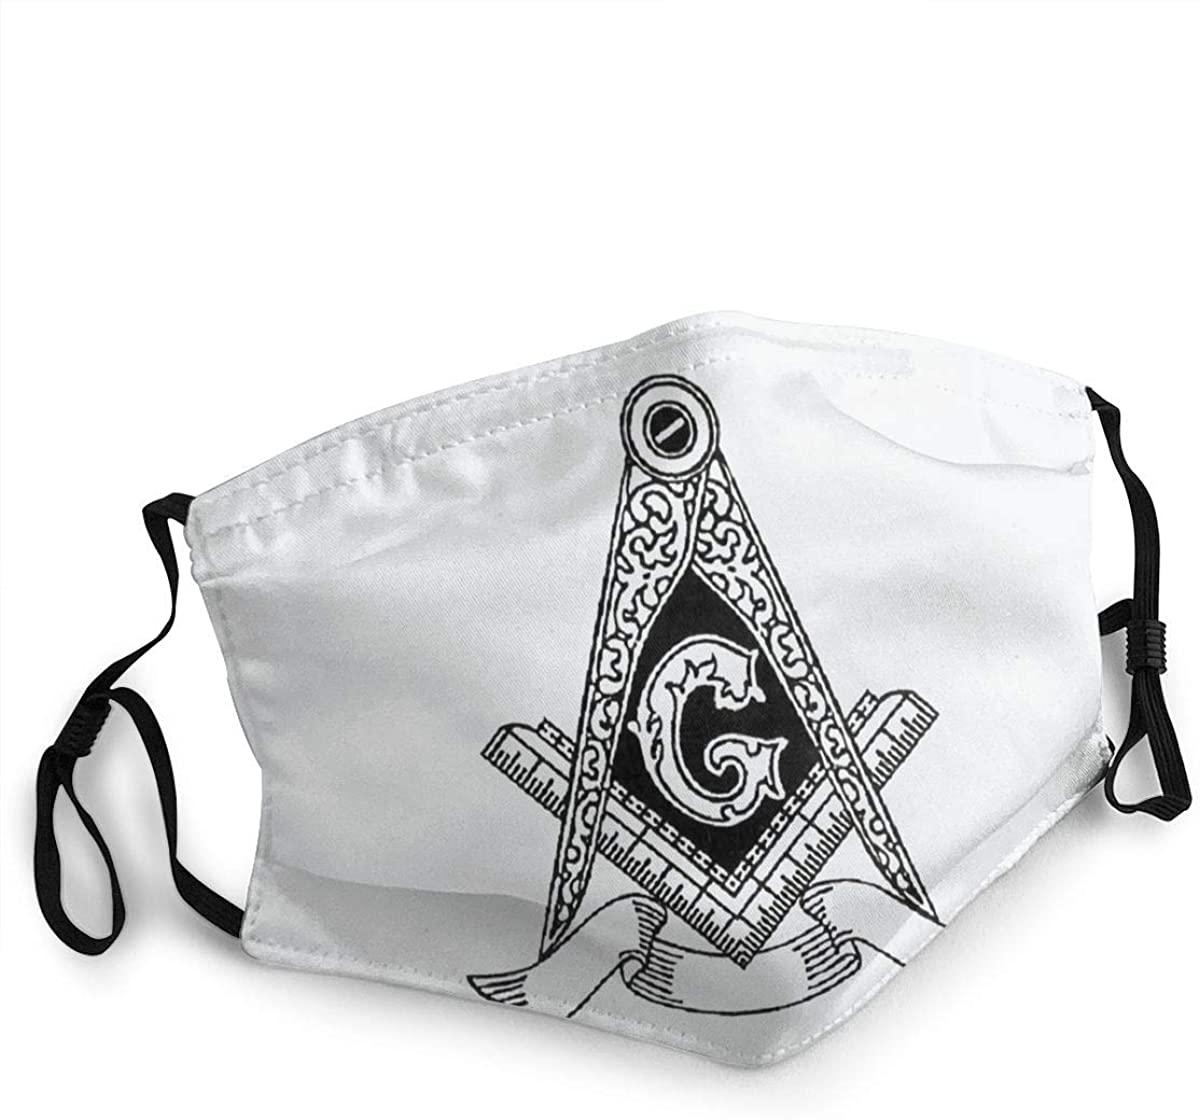 Freemason Can Prevent Allergies, Smog, Exhaust Gas And Low Temperature, Allergic Substances, Etc.